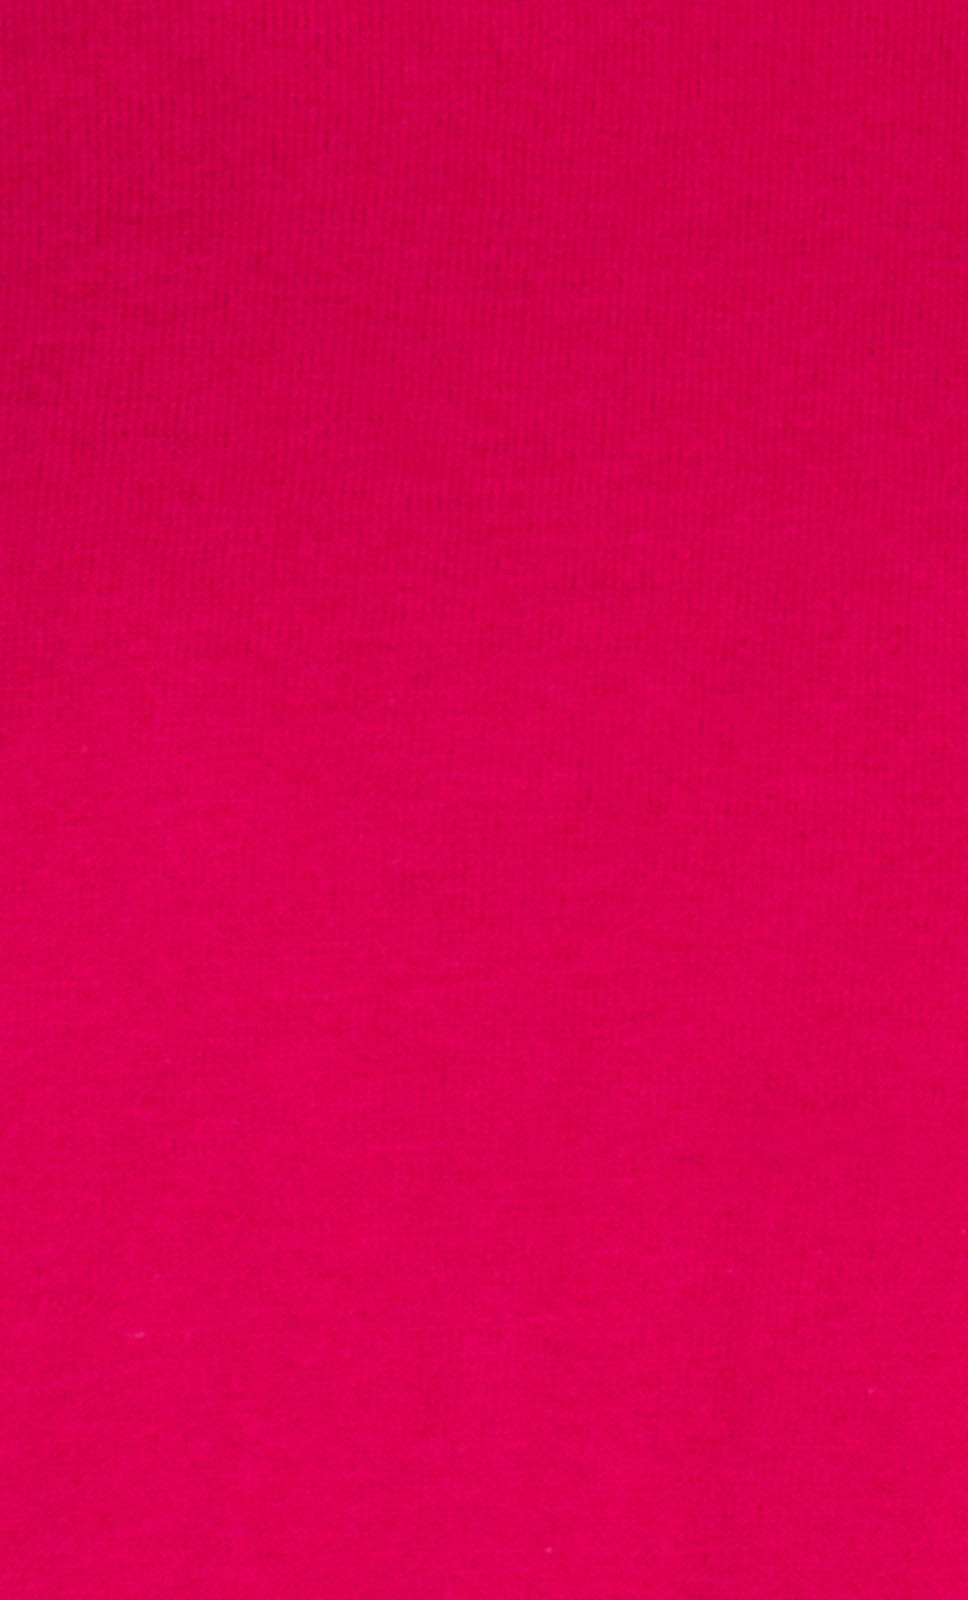 Cocoon-Lipstick-Pink